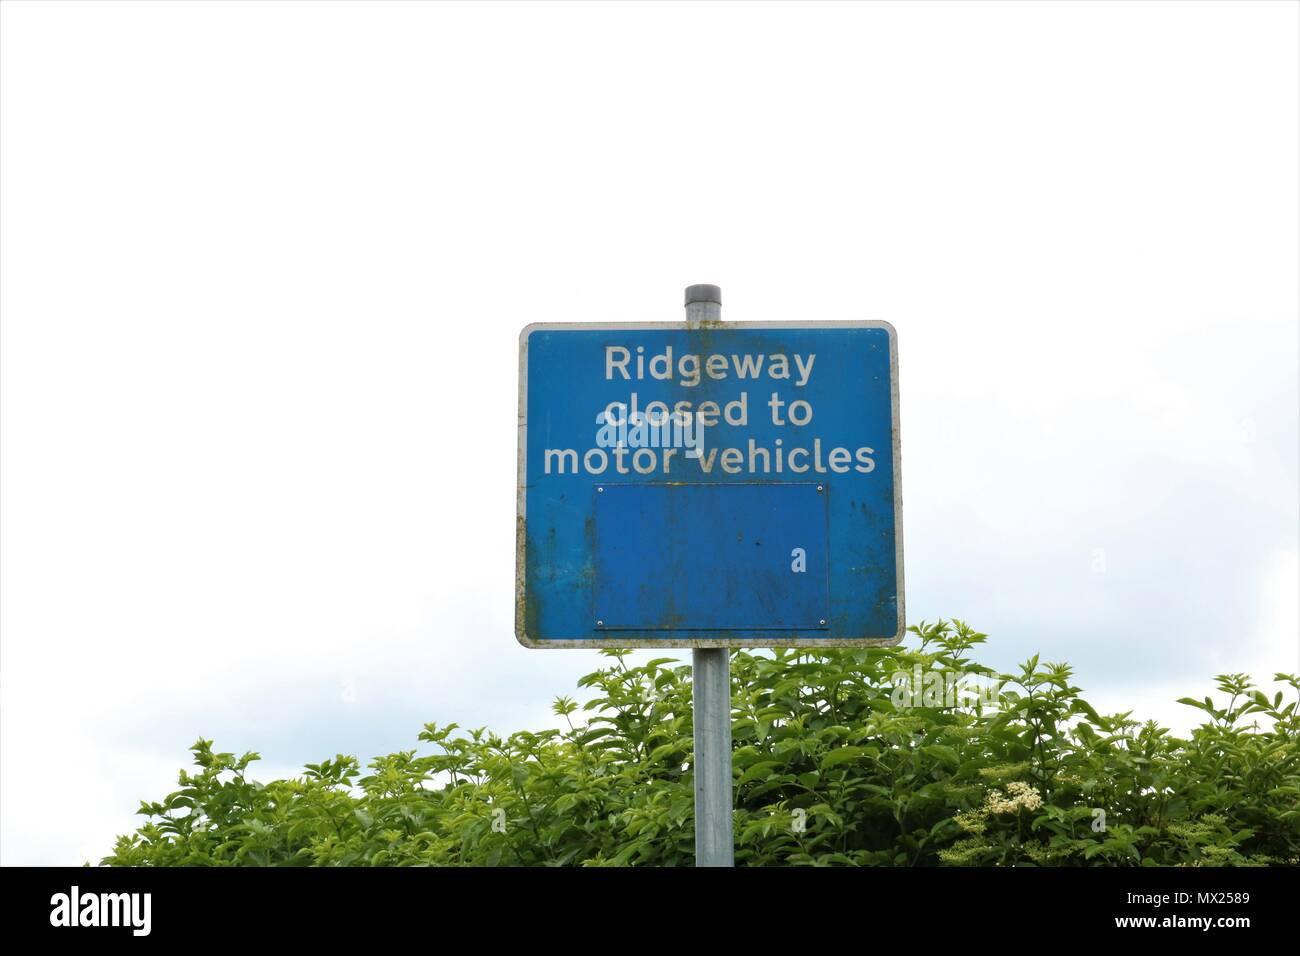 'Ridgeway closed to motor vehicles' blue sign at White Horse Hill, Uffington, Faringdon, Oxfordshire, UK - Stock Image